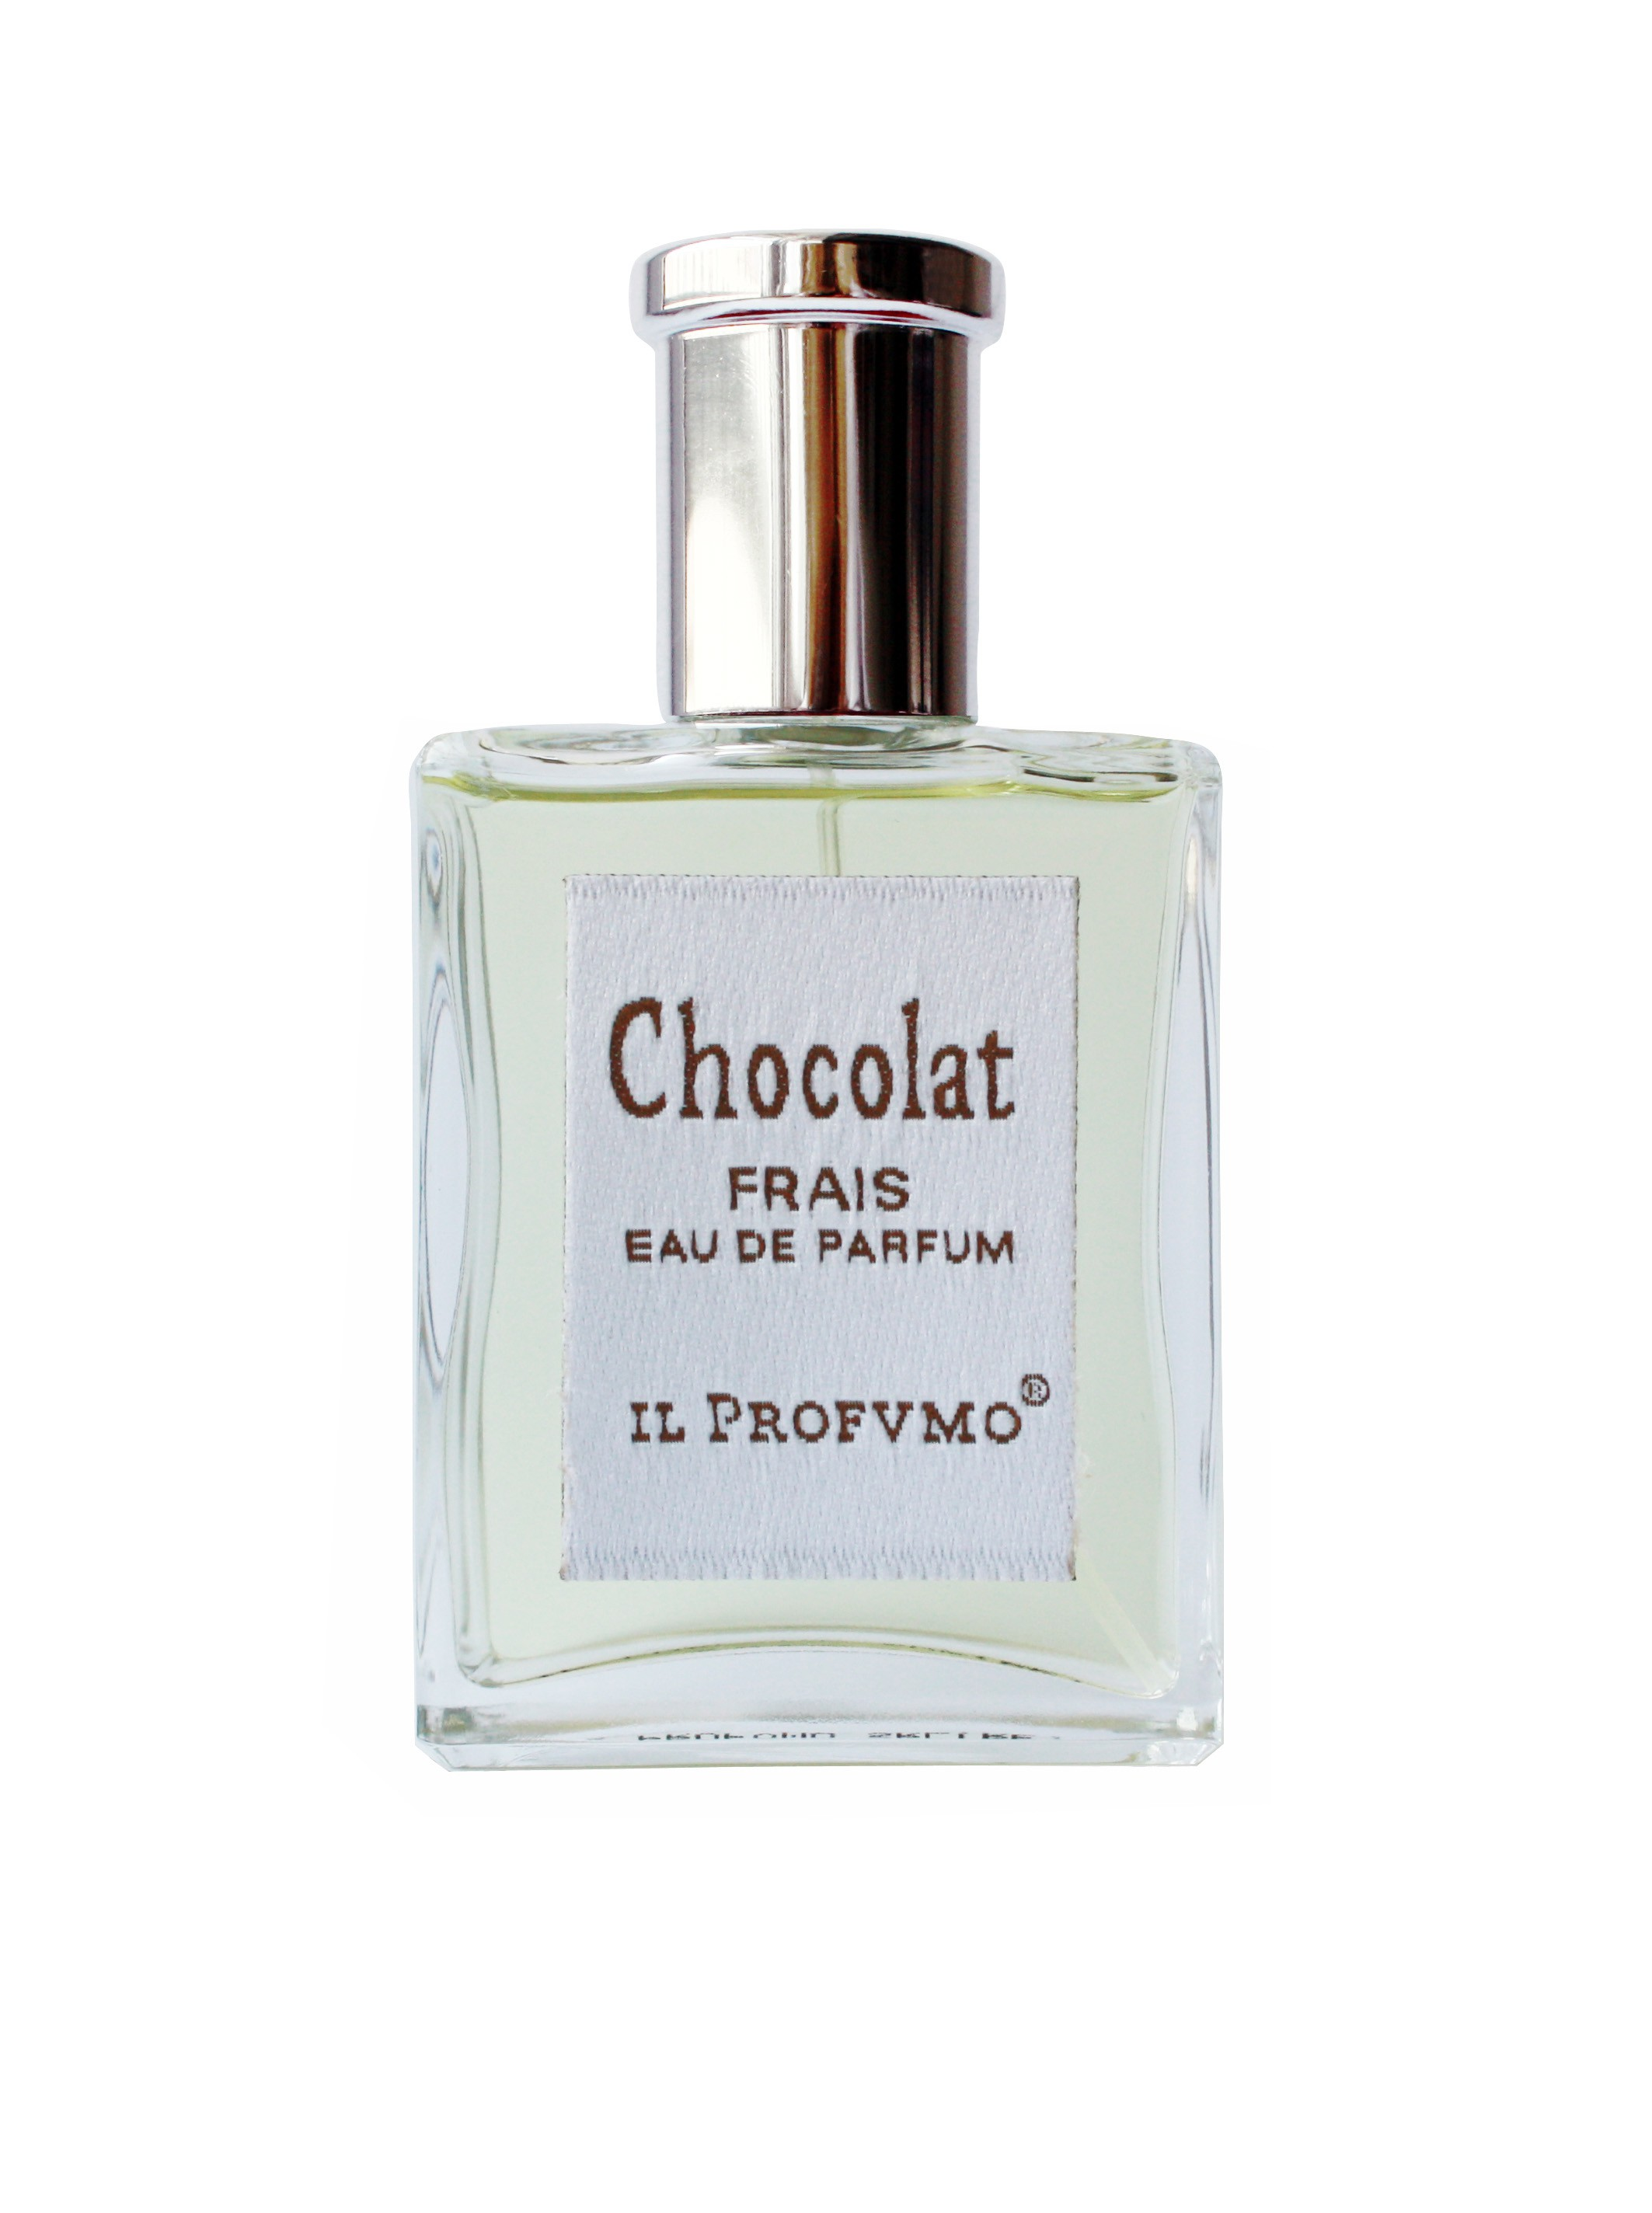 Il Profvmo Chocolat Frais аромат для женщин